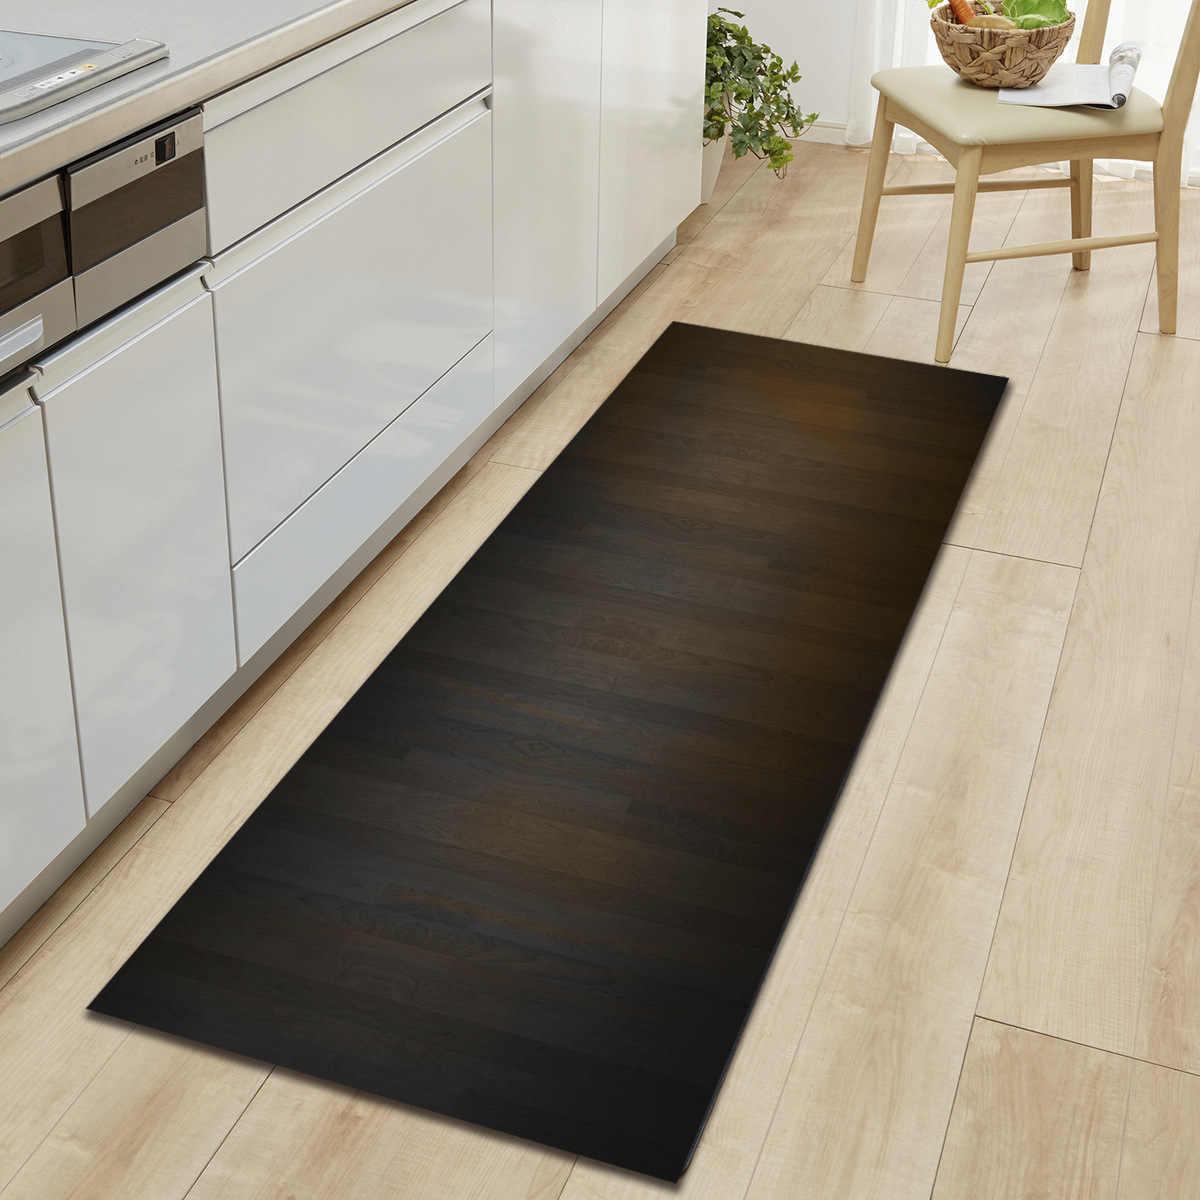 Long Striped Printed Floor Mats Microfiber 3D Carpet Memory Foam Kitchen  Mat Absorbent Doormat Oriental Home Decor Hallway Rugs